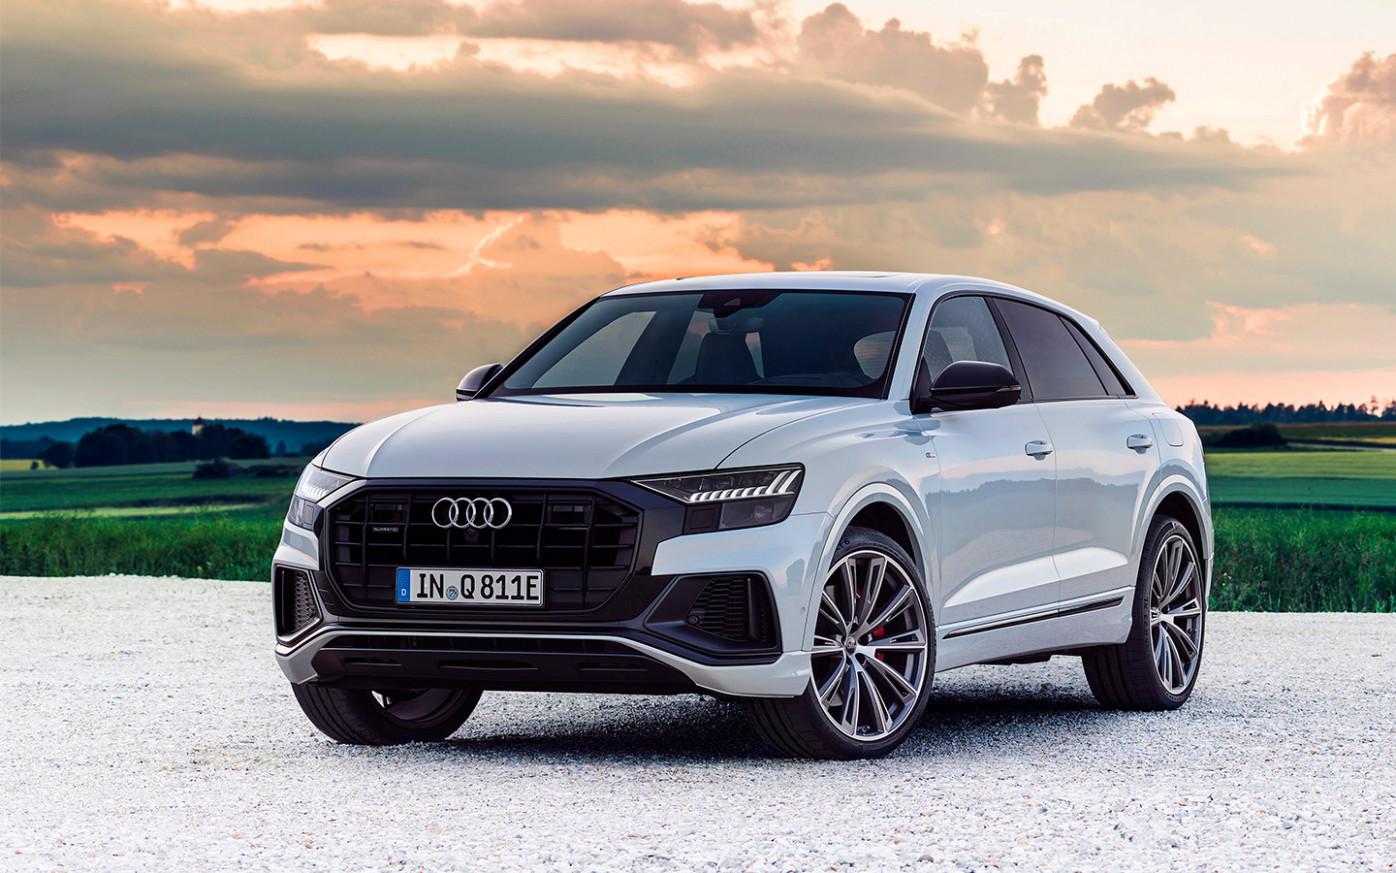 Performance and New Engine 2022 Audi Q8